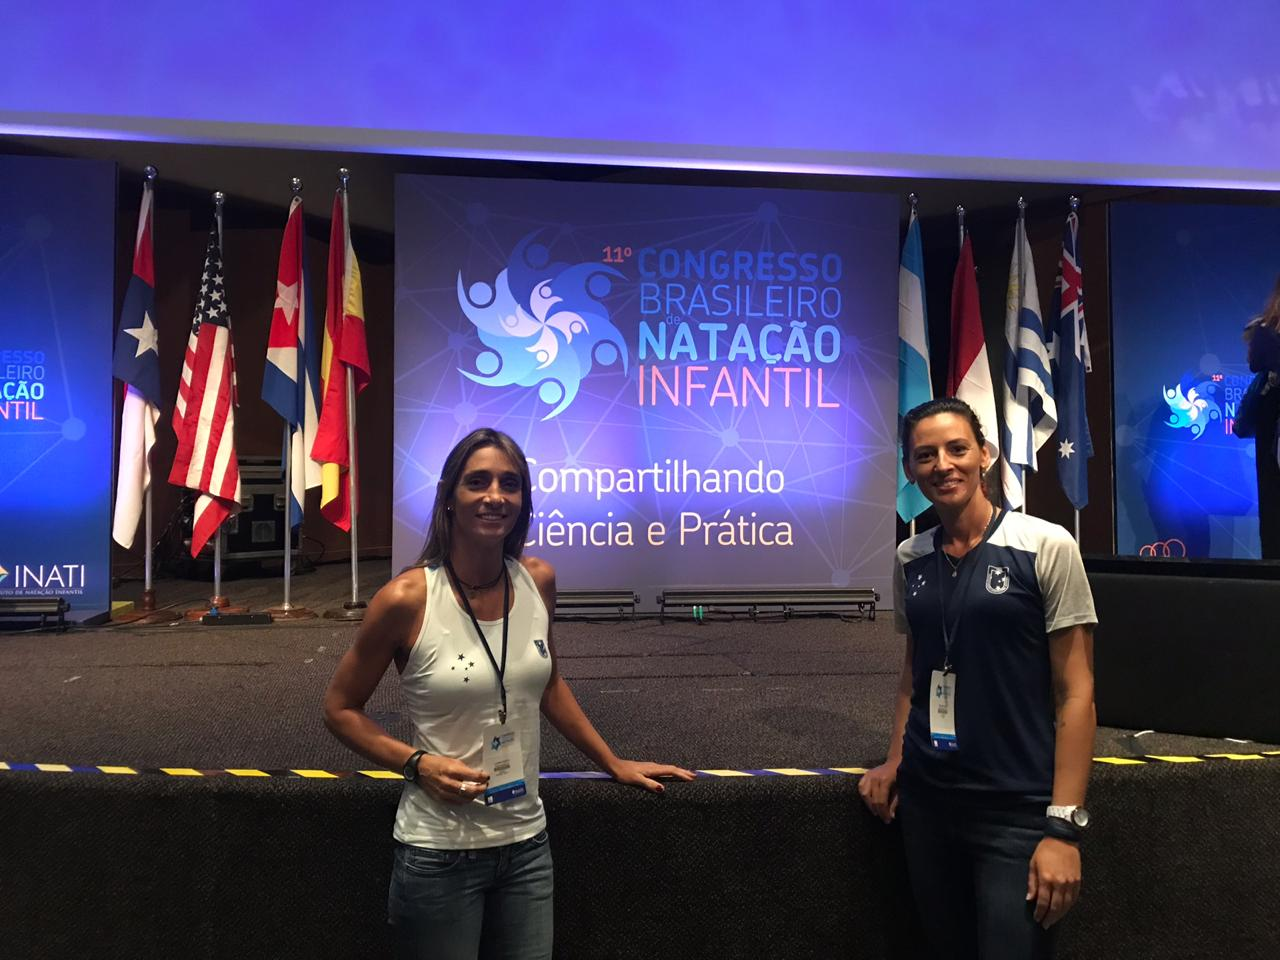 Da esquerda para direita: Luciana Pigatto / Fabiana Zago